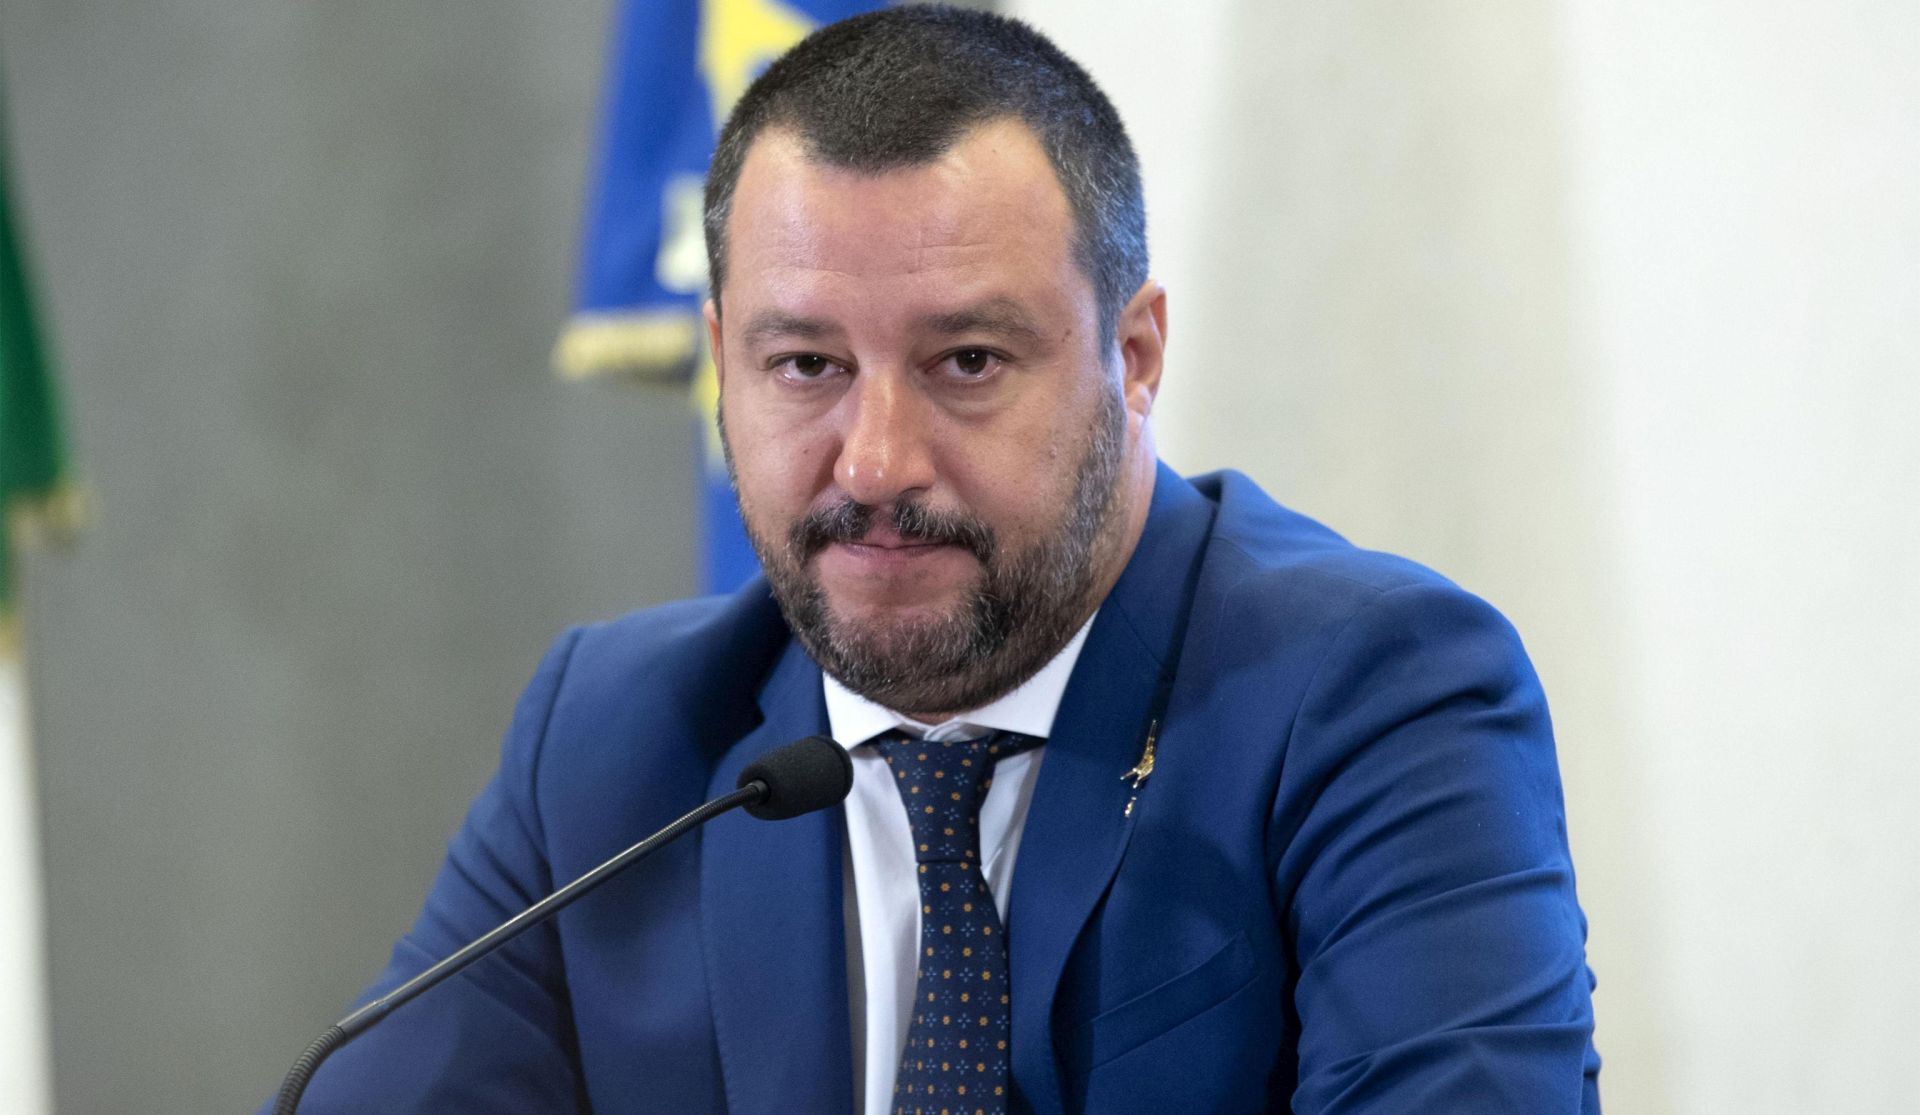 Odobrena pljenidba 49 milijuna eura vodeće talijanske stranke Lige